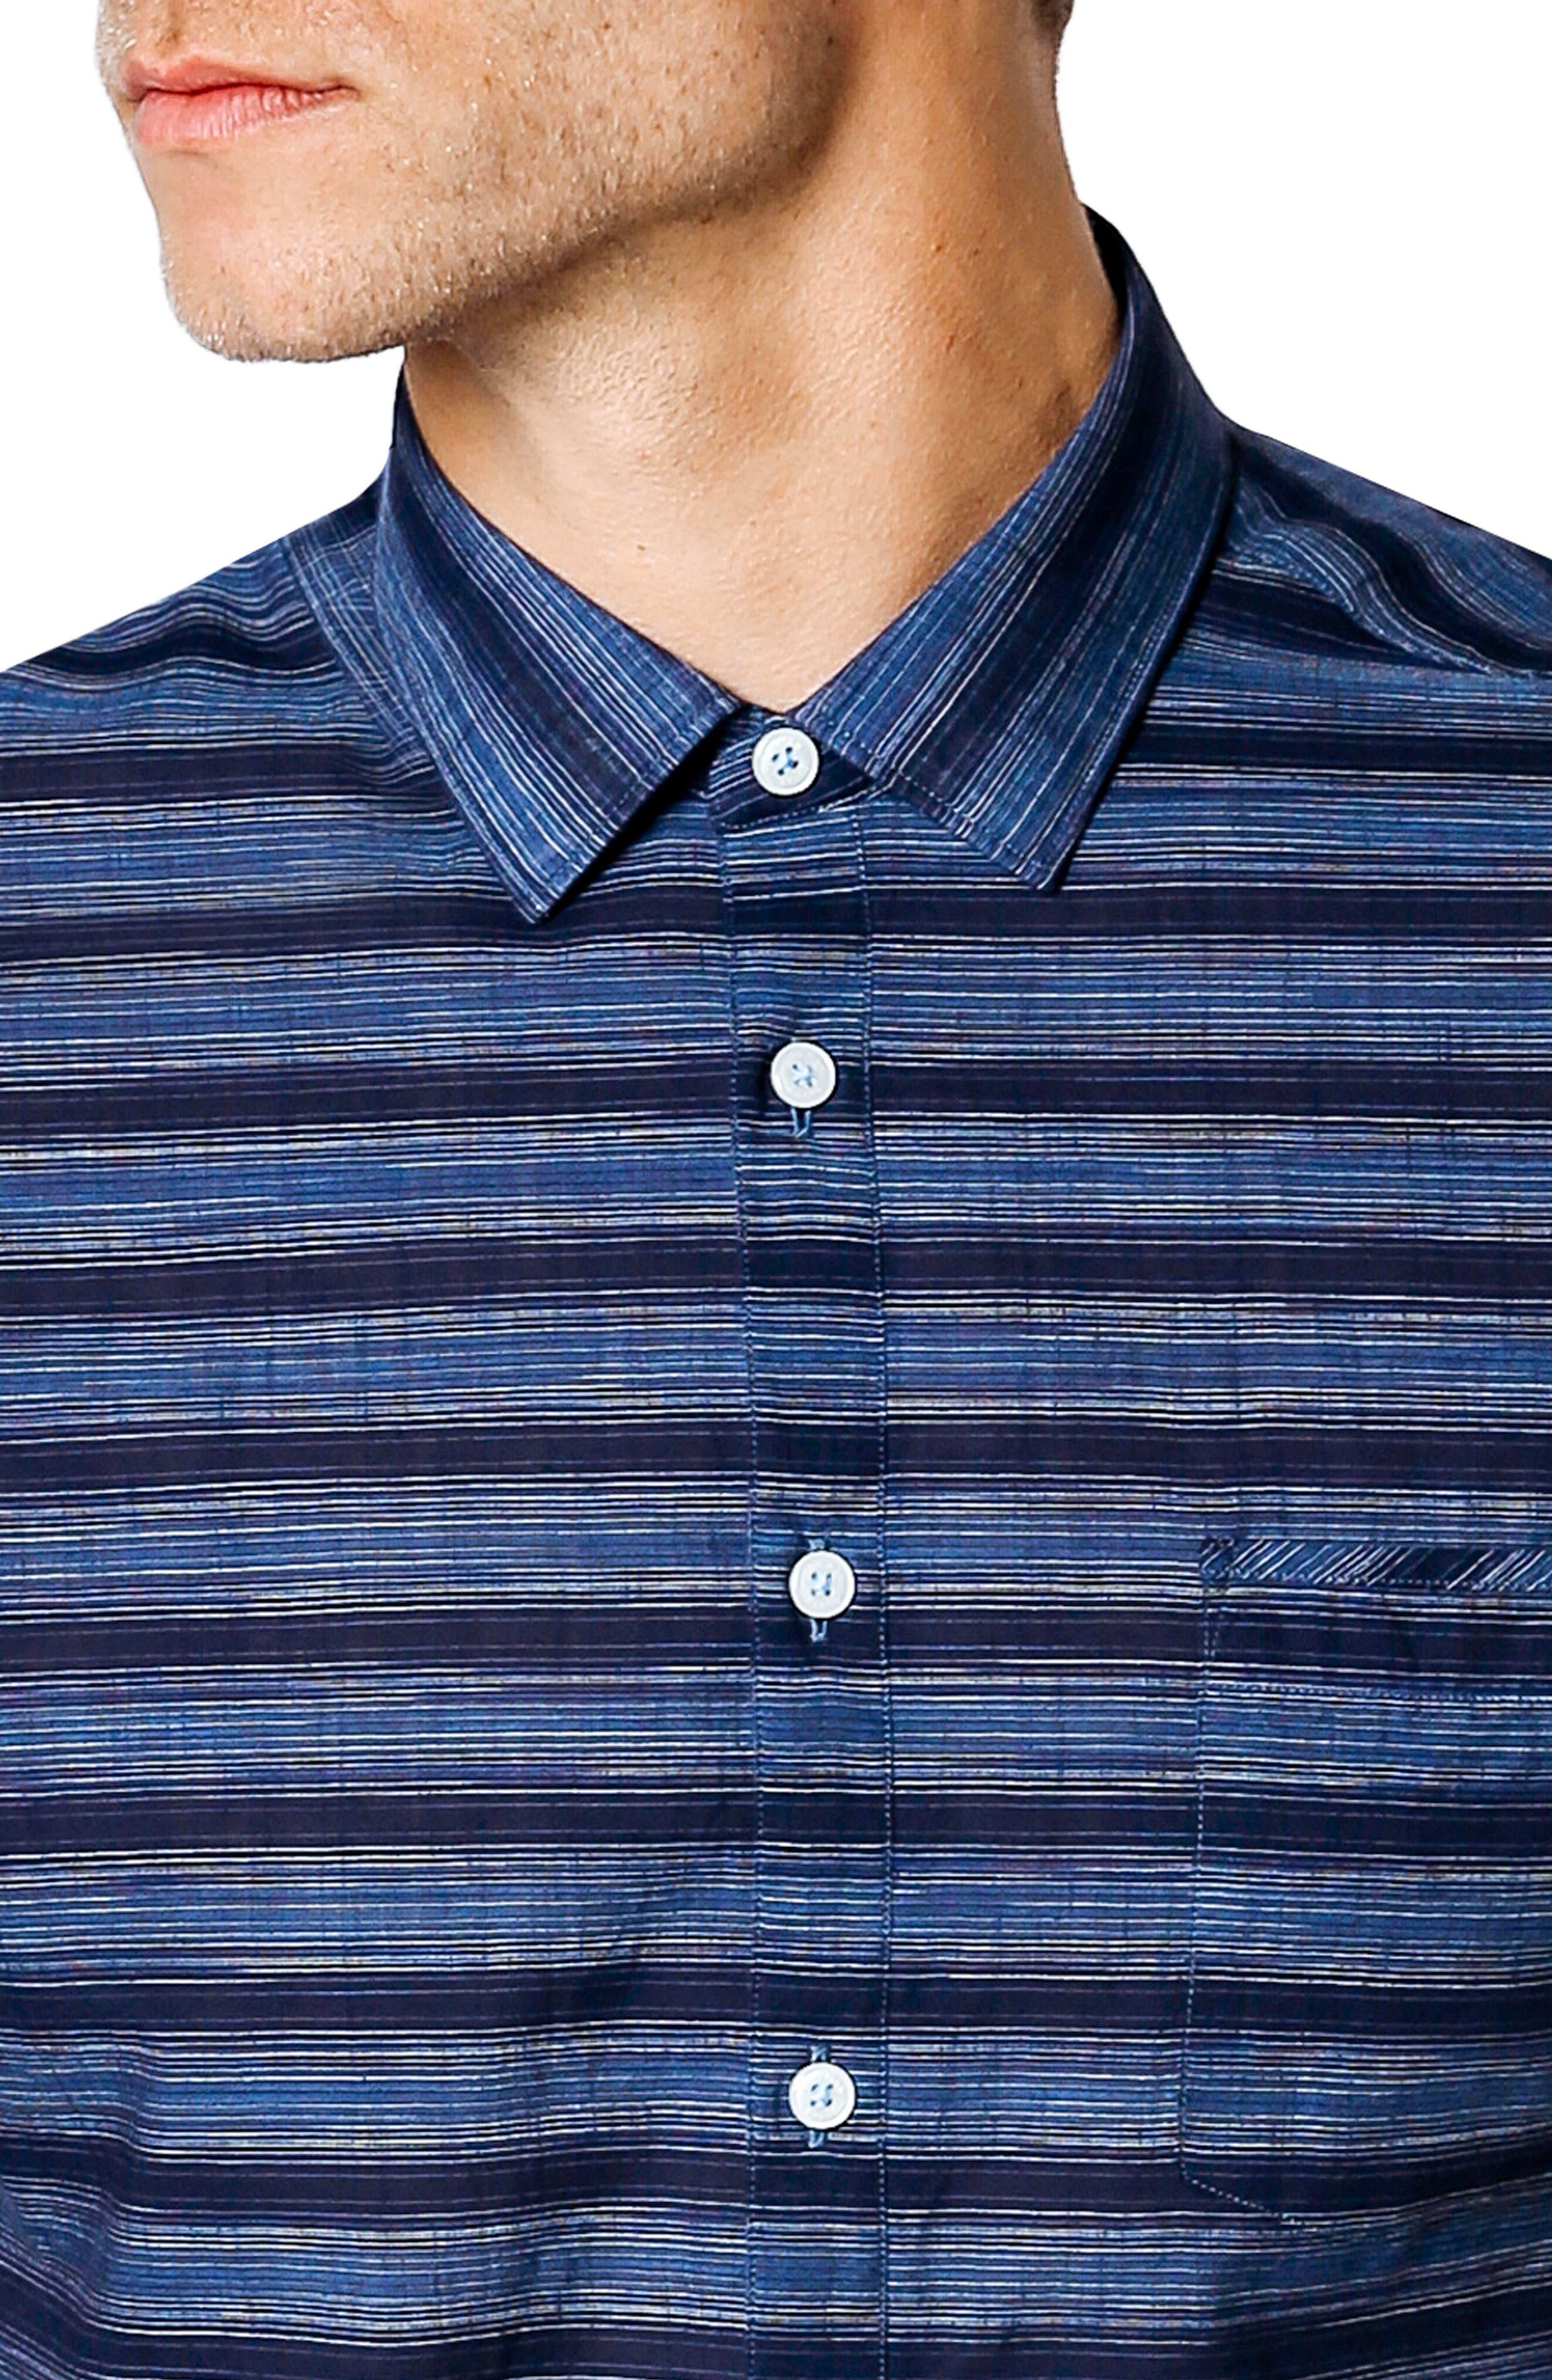 Slim Fit Short Sleeve Sport Shirt,                             Alternate thumbnail 4, color,                             NAVY